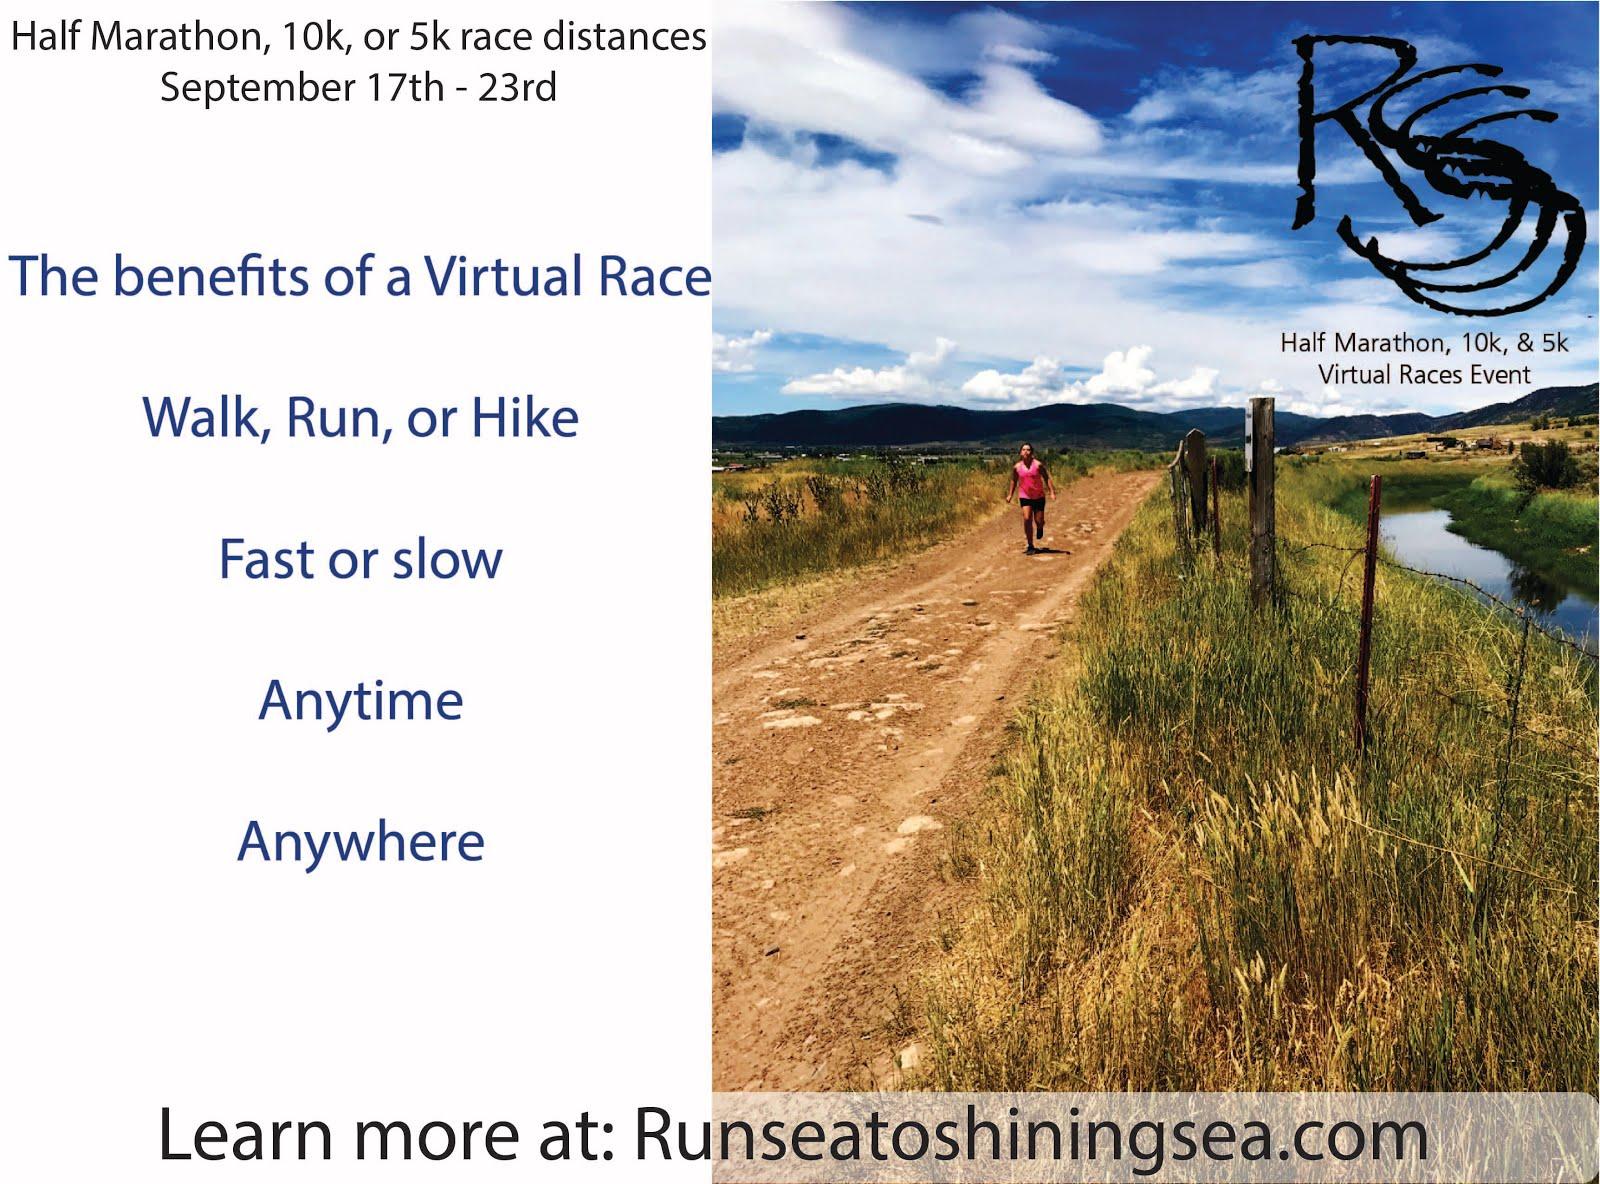 Run, Walk, or Hike Our Race